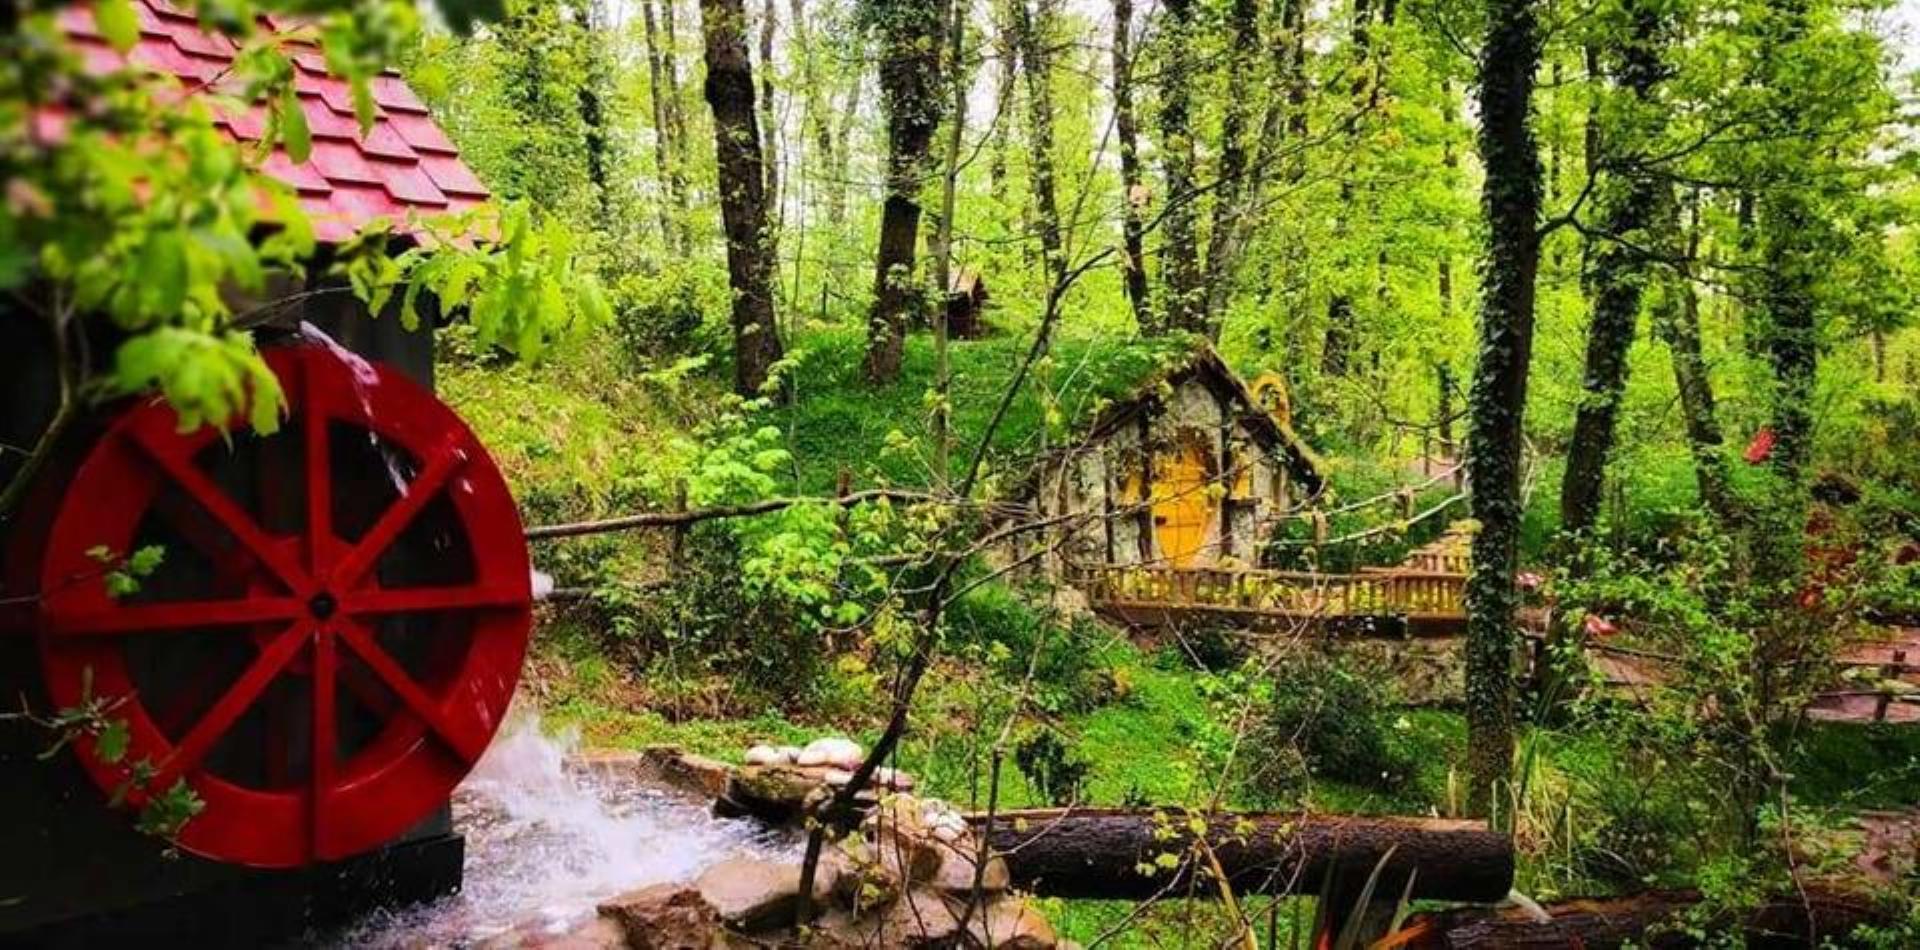 Maşukiye - Sapanca - Kartepe - Ormanya Turu